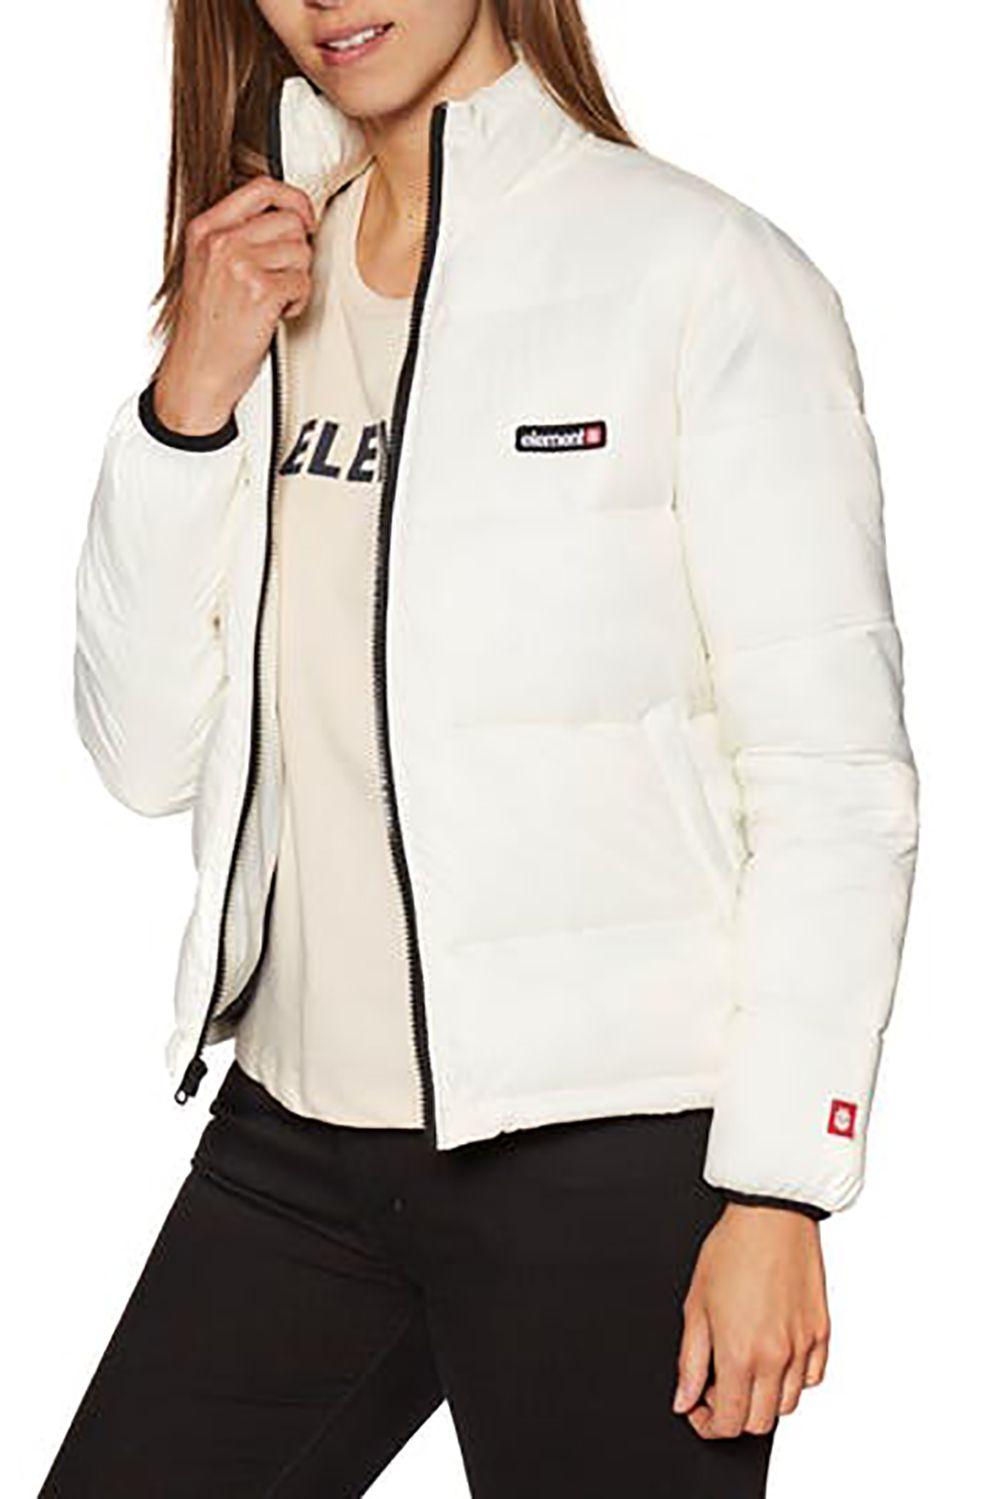 Element Jacket PRIMO ARCTIC ELEMENT PRIMO Off White